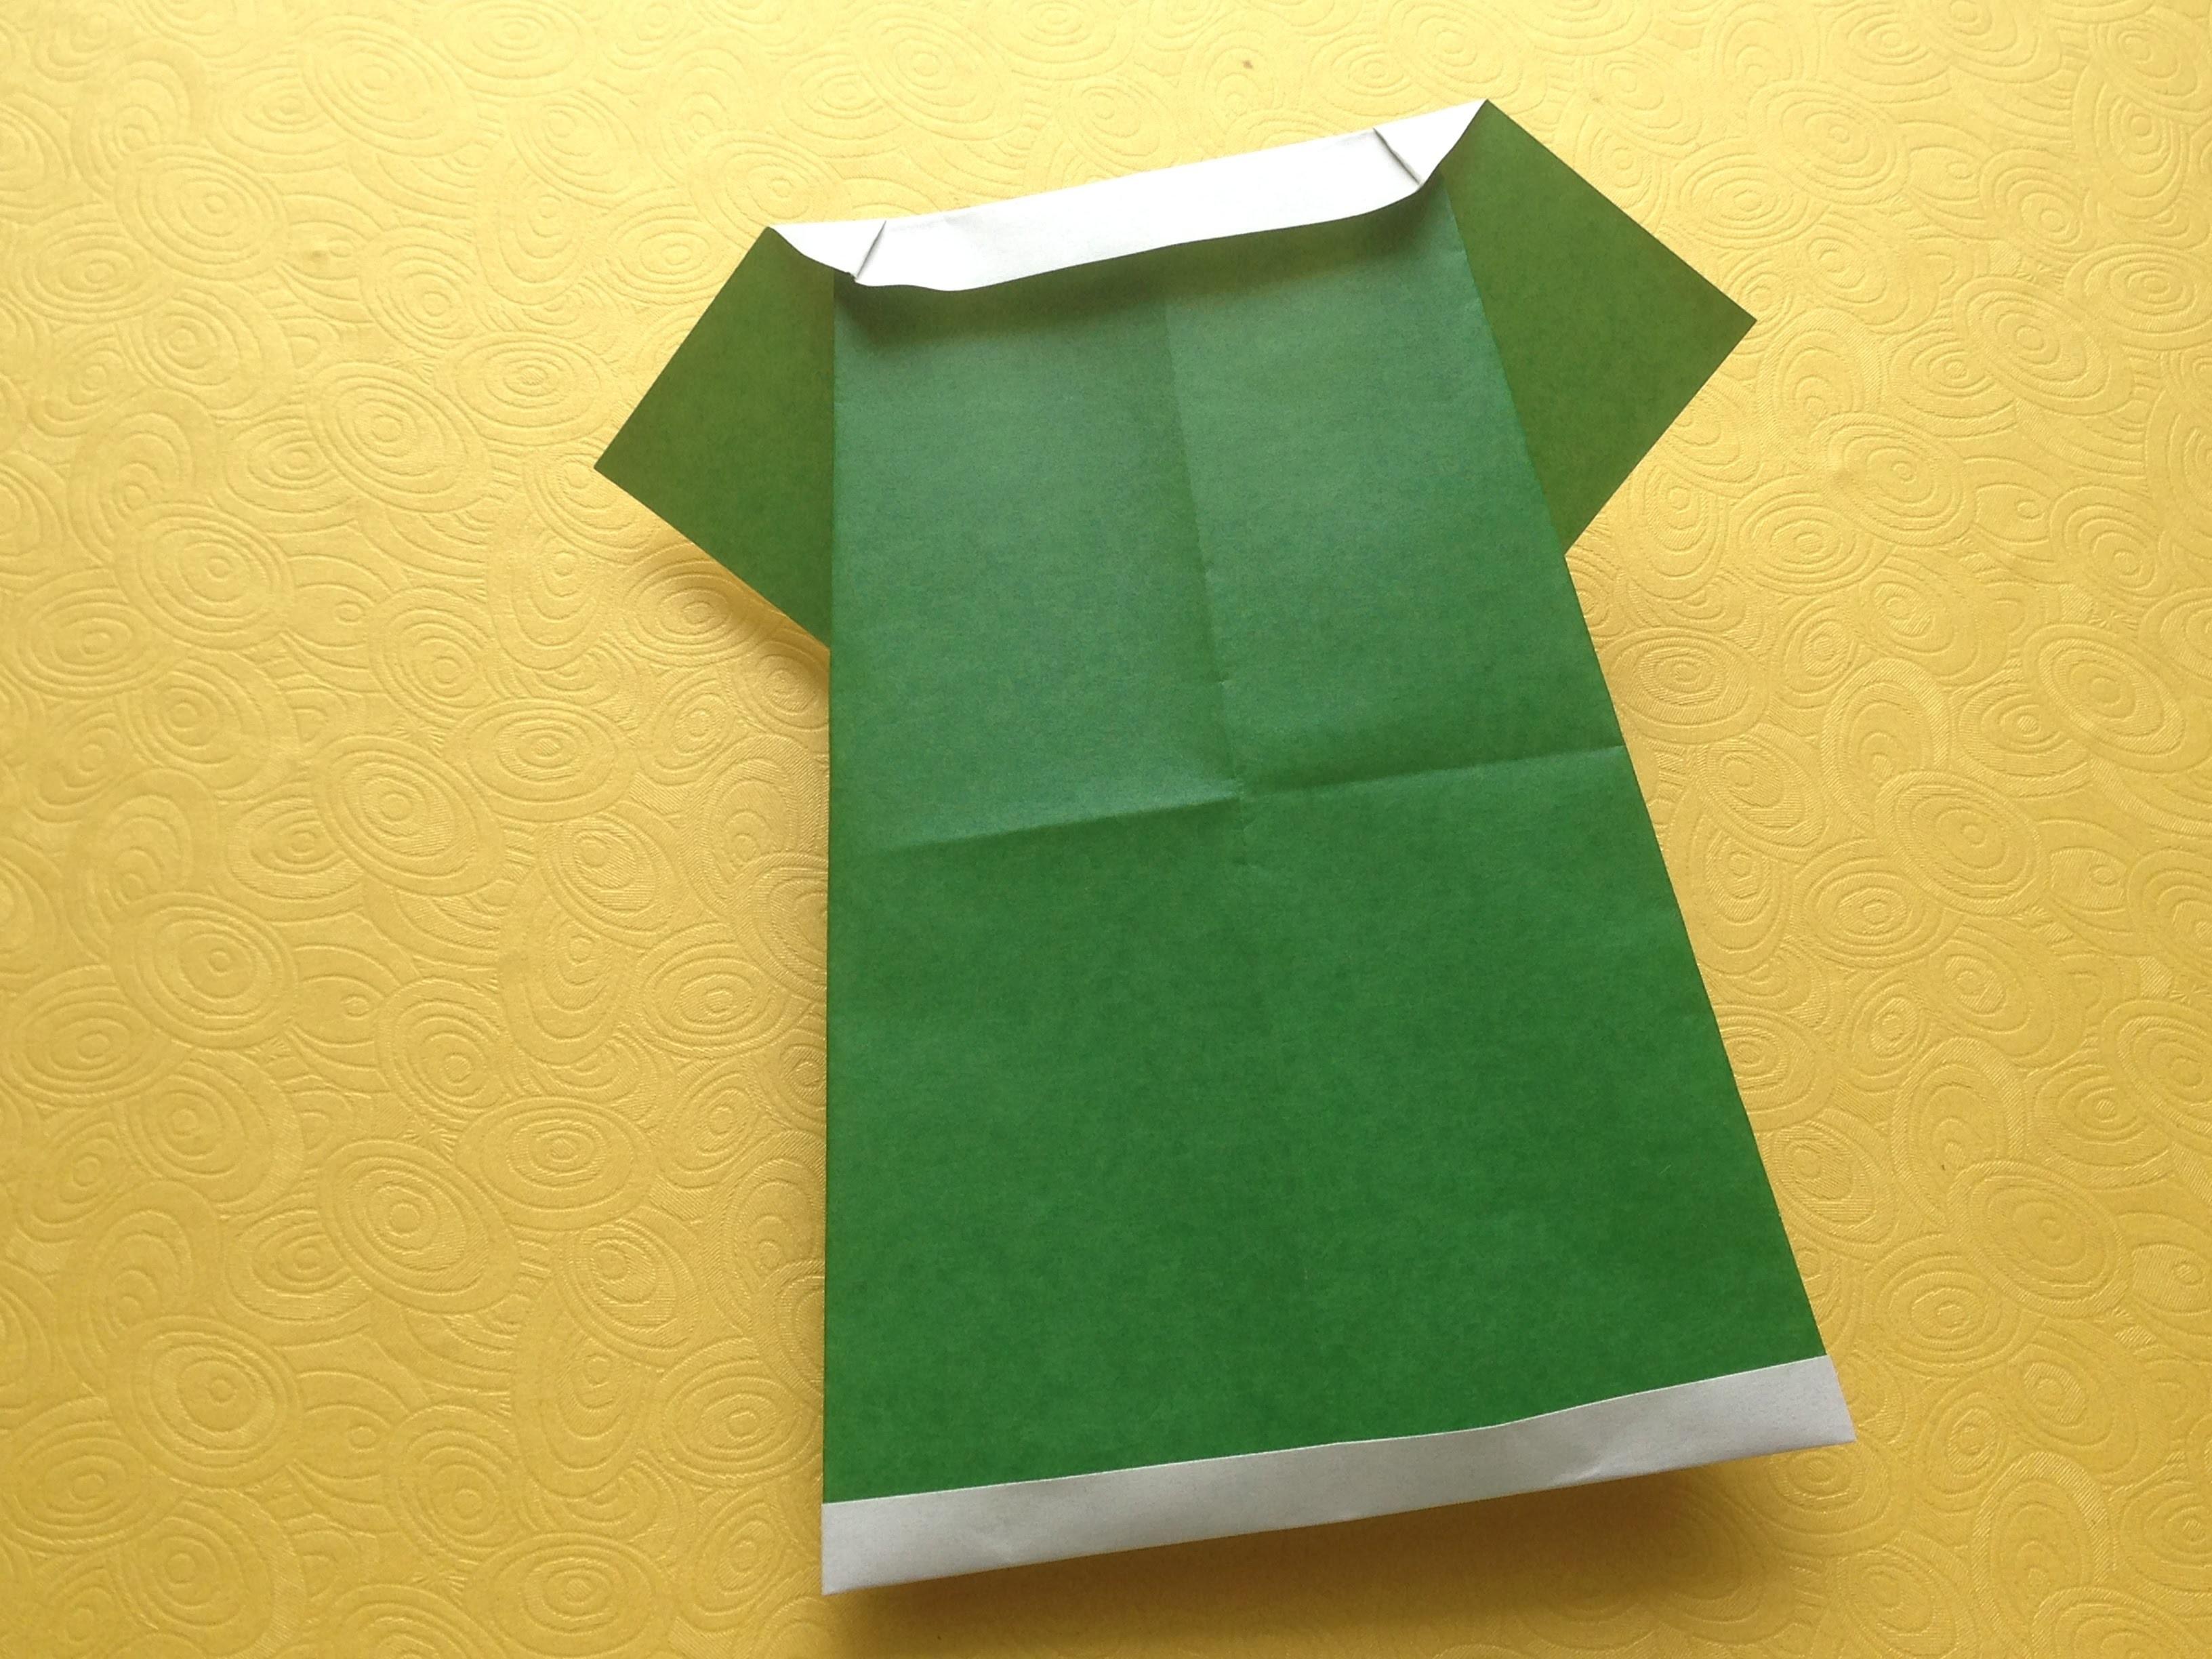 Origami Easy Dress Tutorial - Origami For Beginners